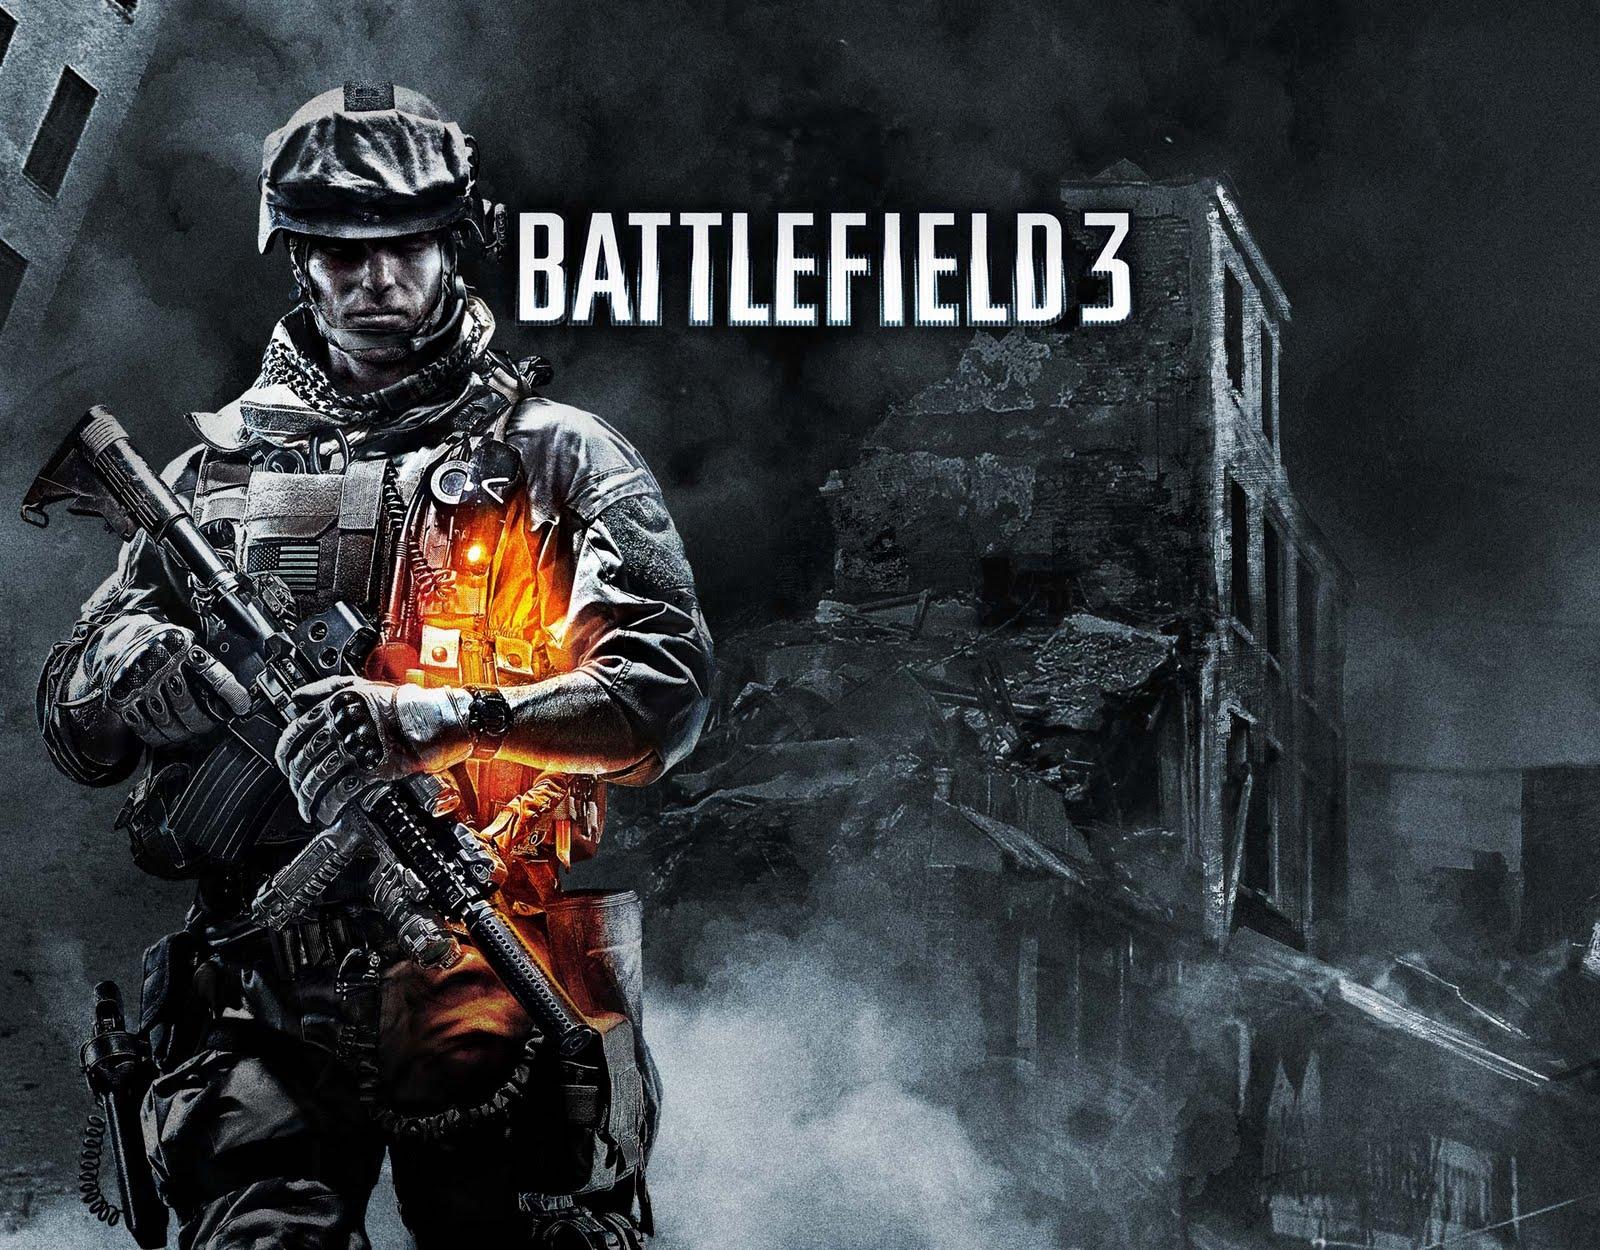 http://4.bp.blogspot.com/-timfFvNFkWg/TqfWaiOwjBI/AAAAAAAAFSY/cCMnTRKc9_o/s1600/Battlefield-3.jpeg